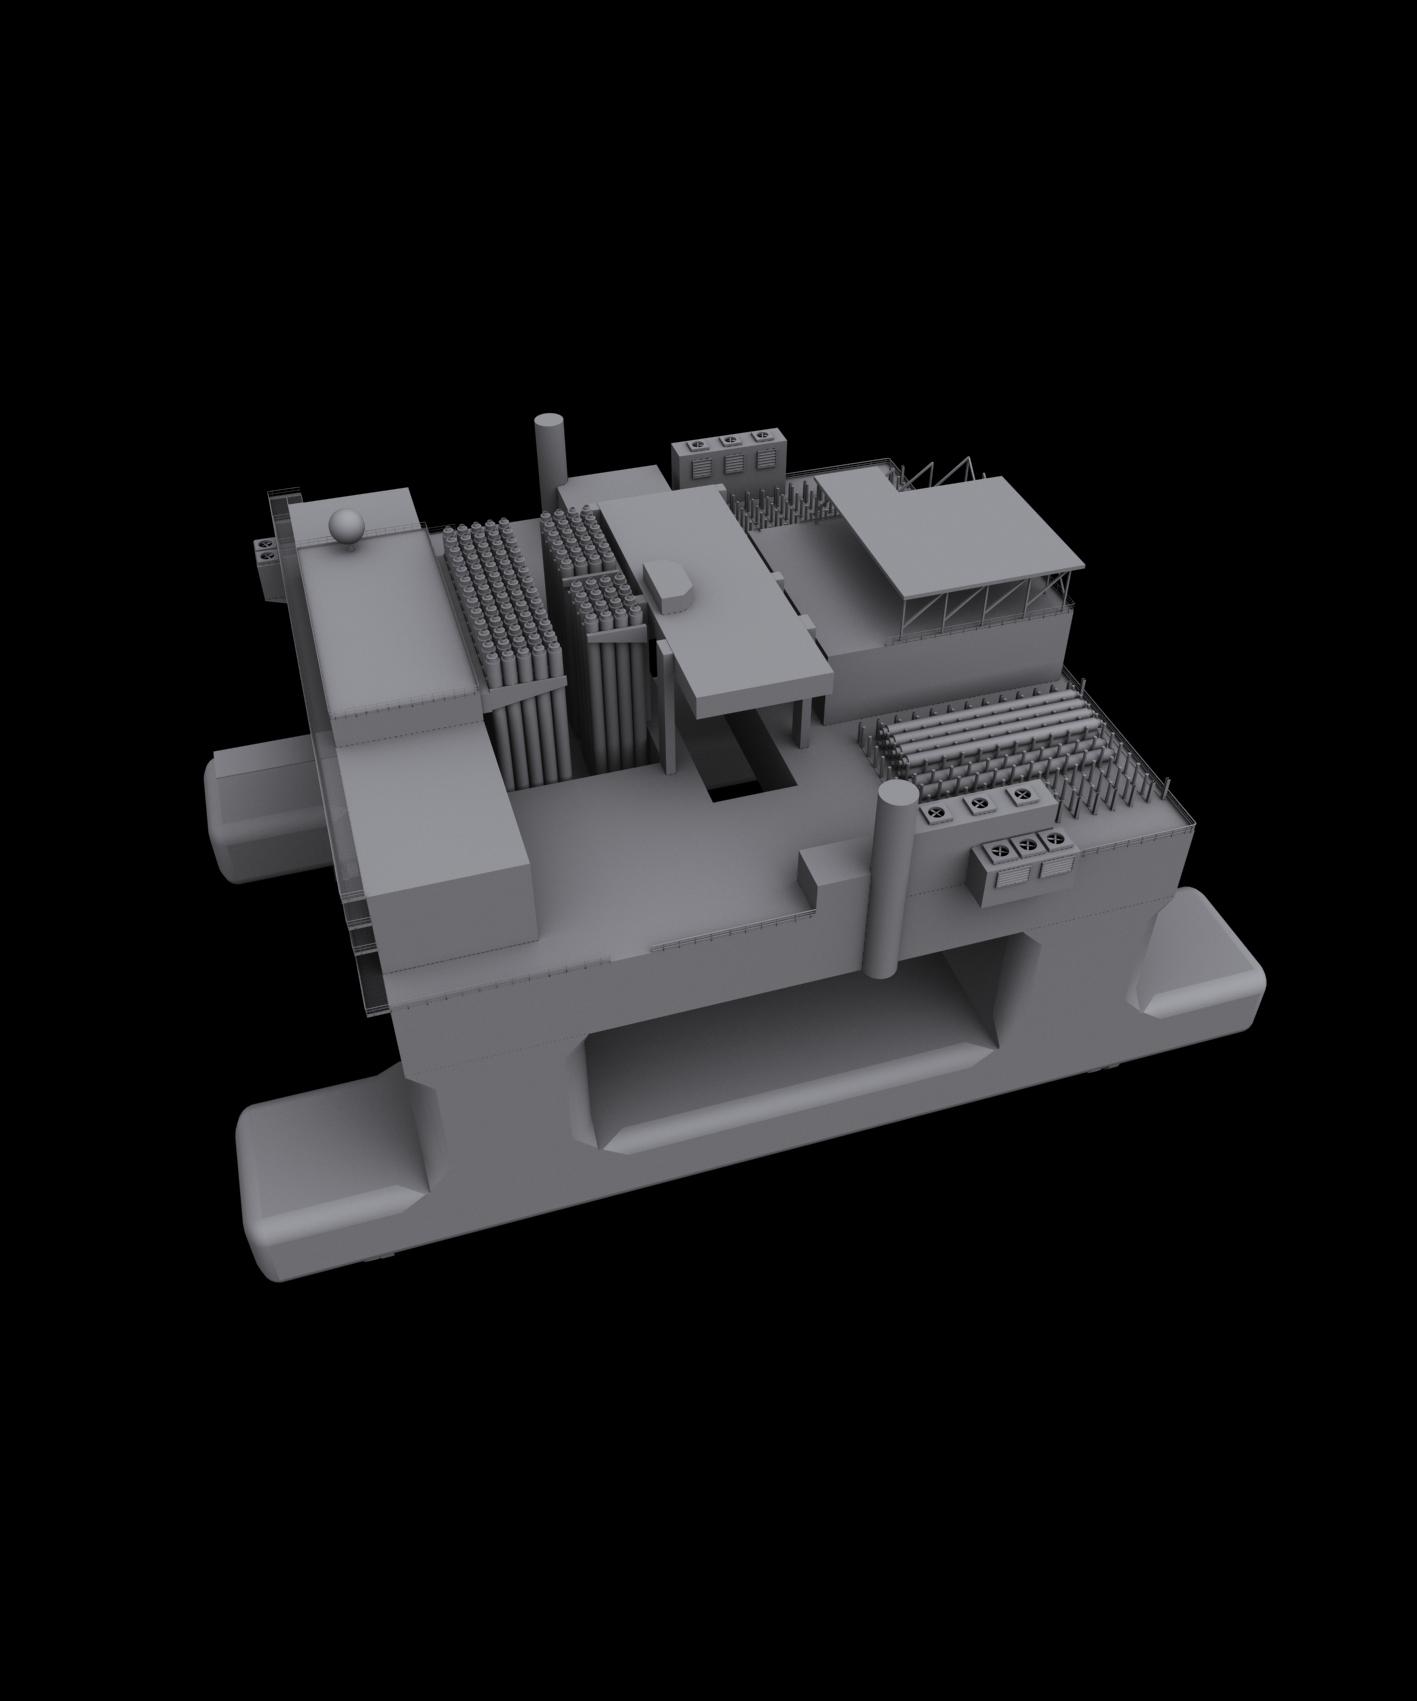 semisub-3d-model-low-detail